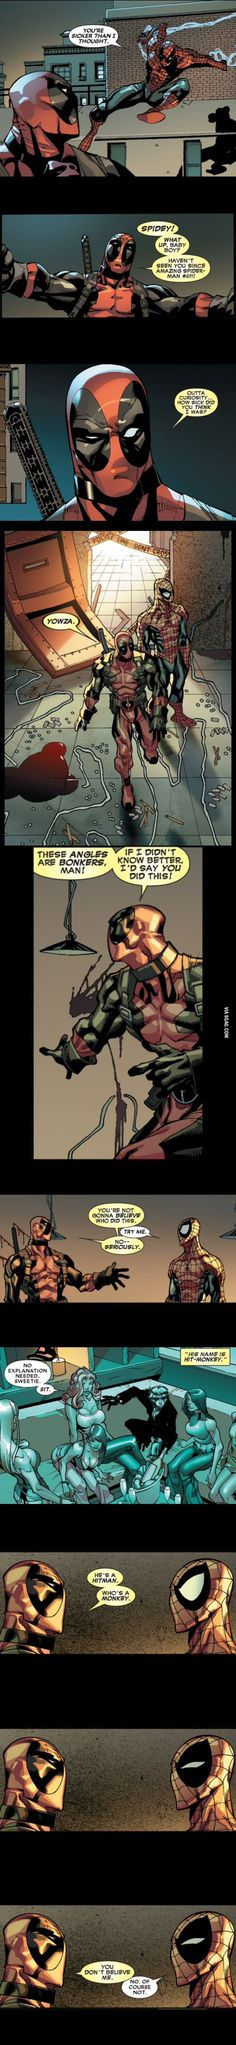 We need more Spidey/Deadpool